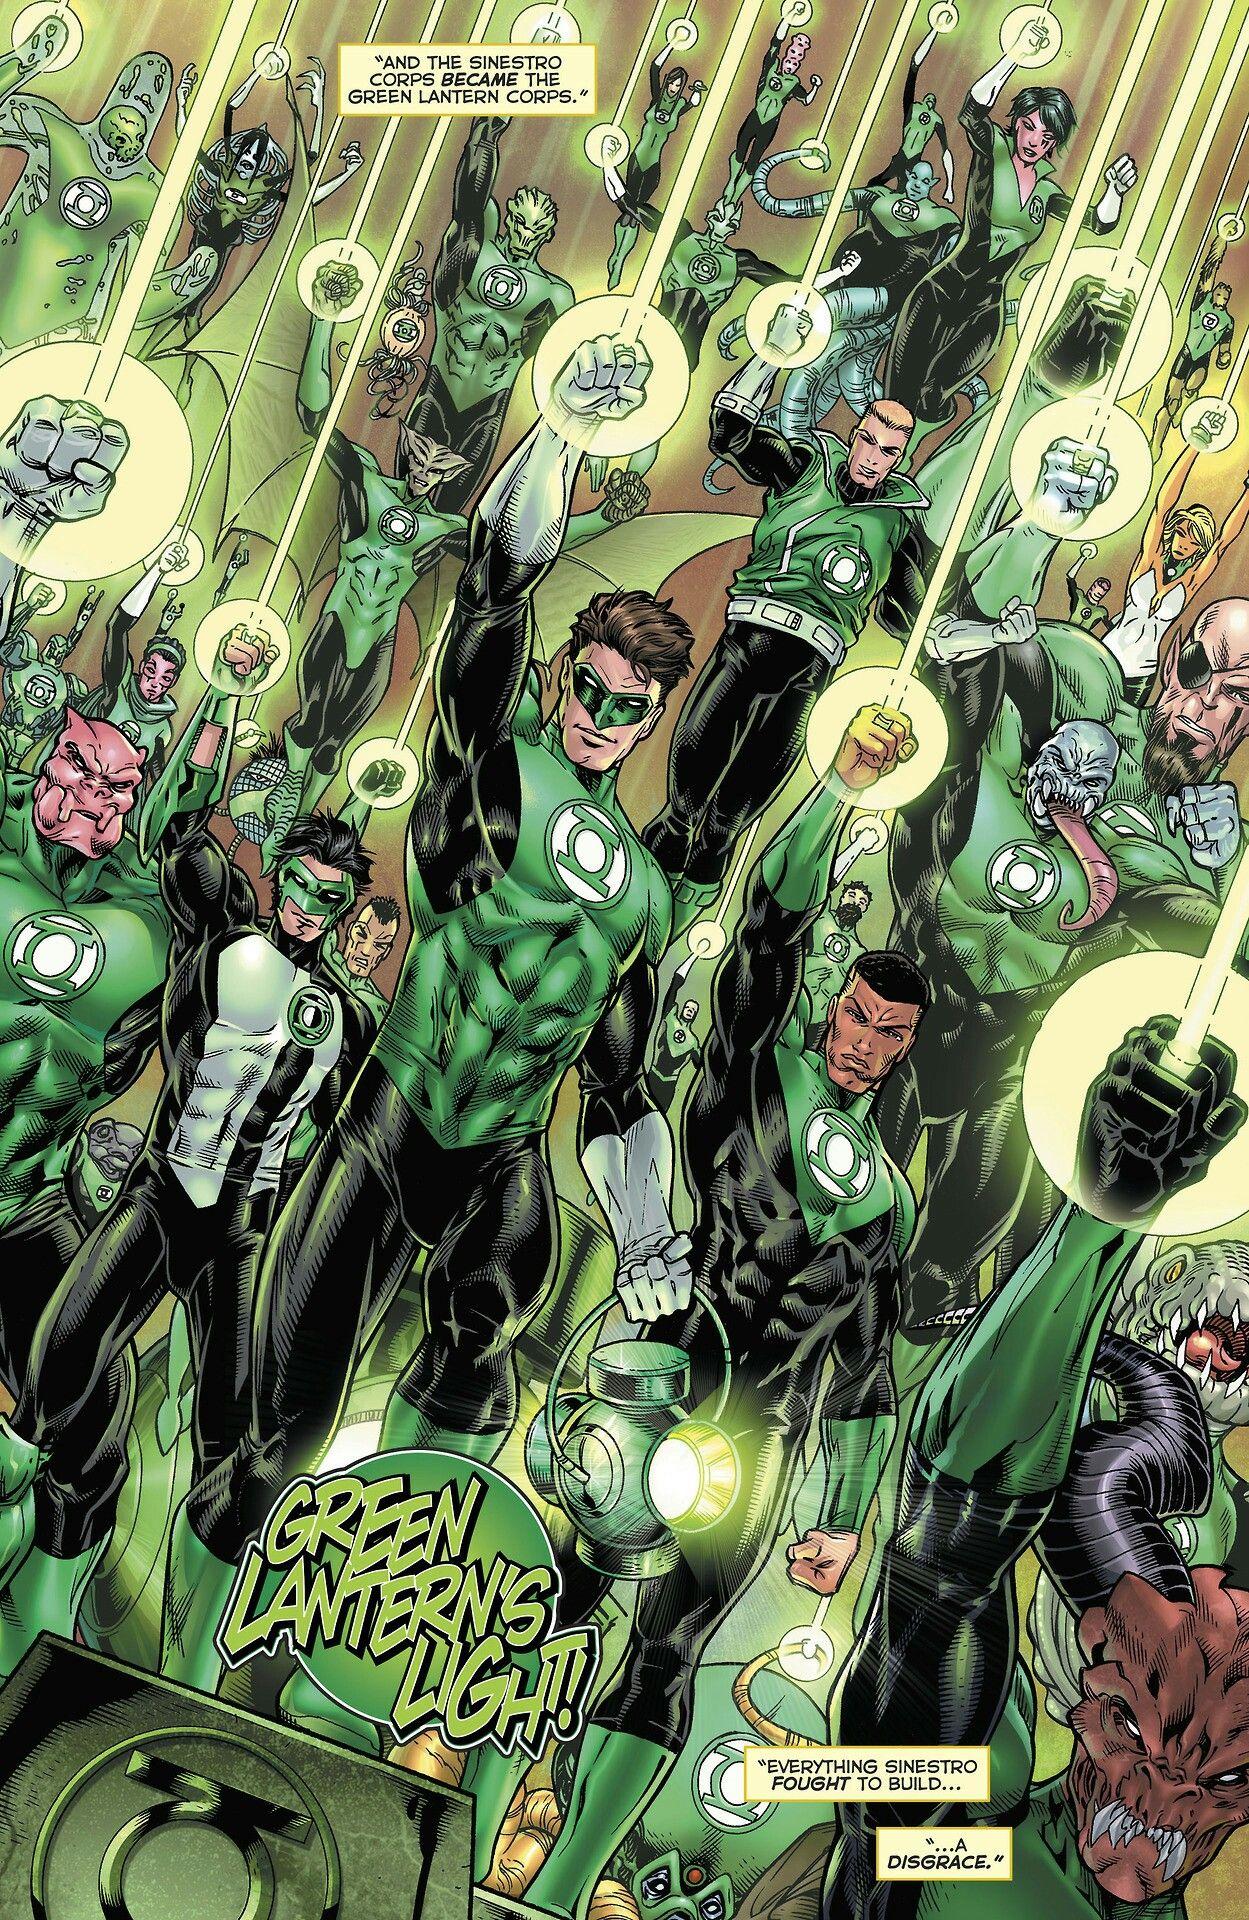 Green Lantern Corps light